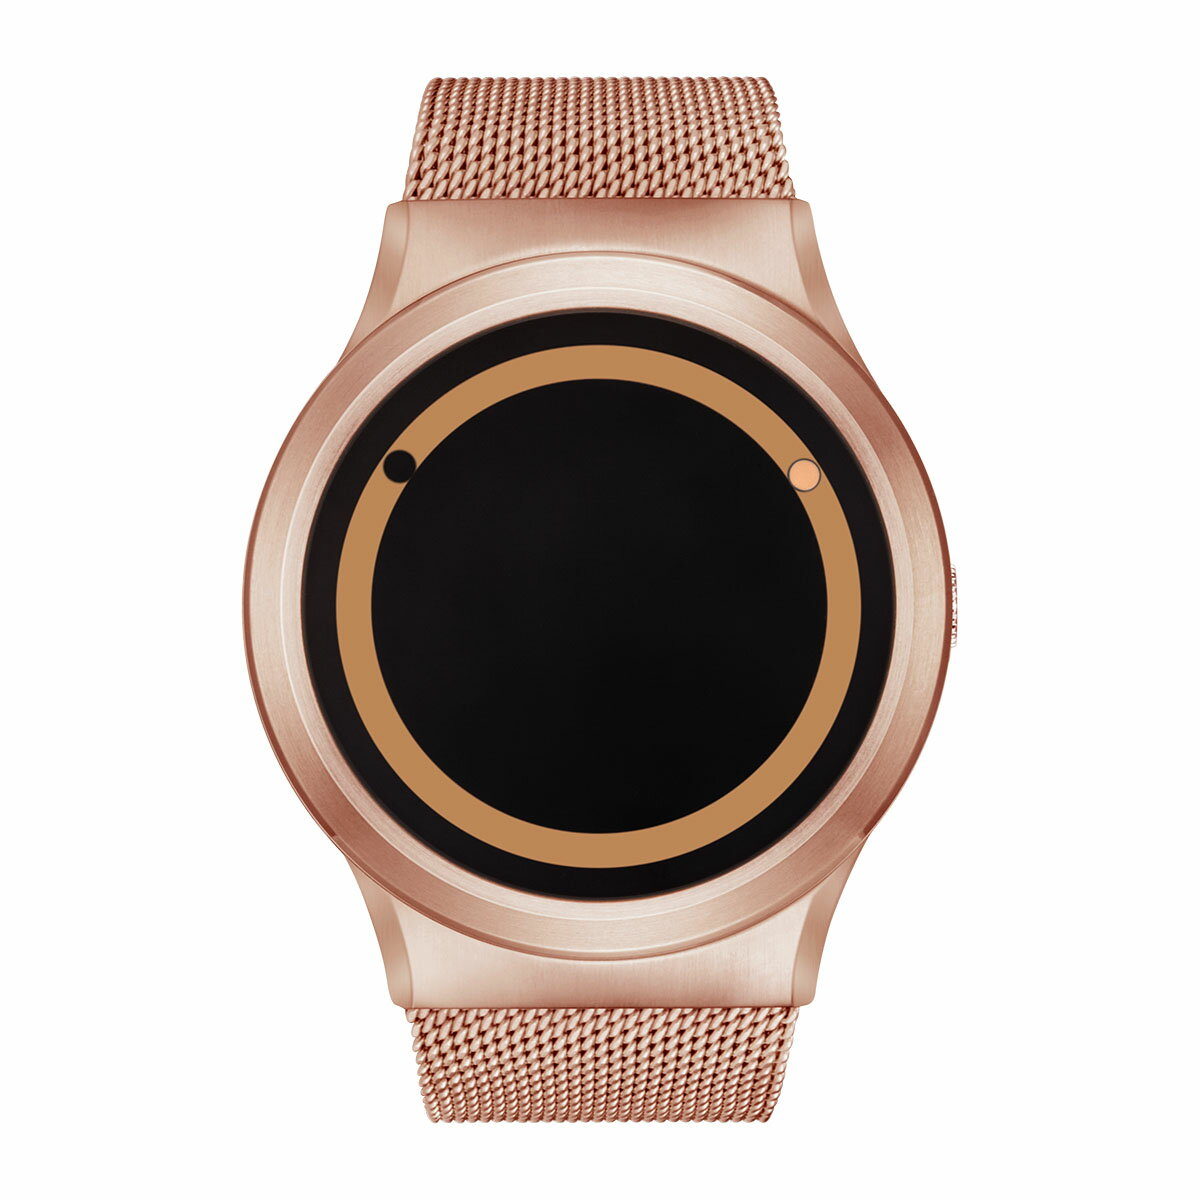 ZEROO PLANET ECLIPSE ゼロ 電池式クォーツ 腕時計 [W13029B05SM05] ベージュ デザインウォッチ ペア用 メンズ レディース ユニセックス おしゃれ時計 デザイナーズ